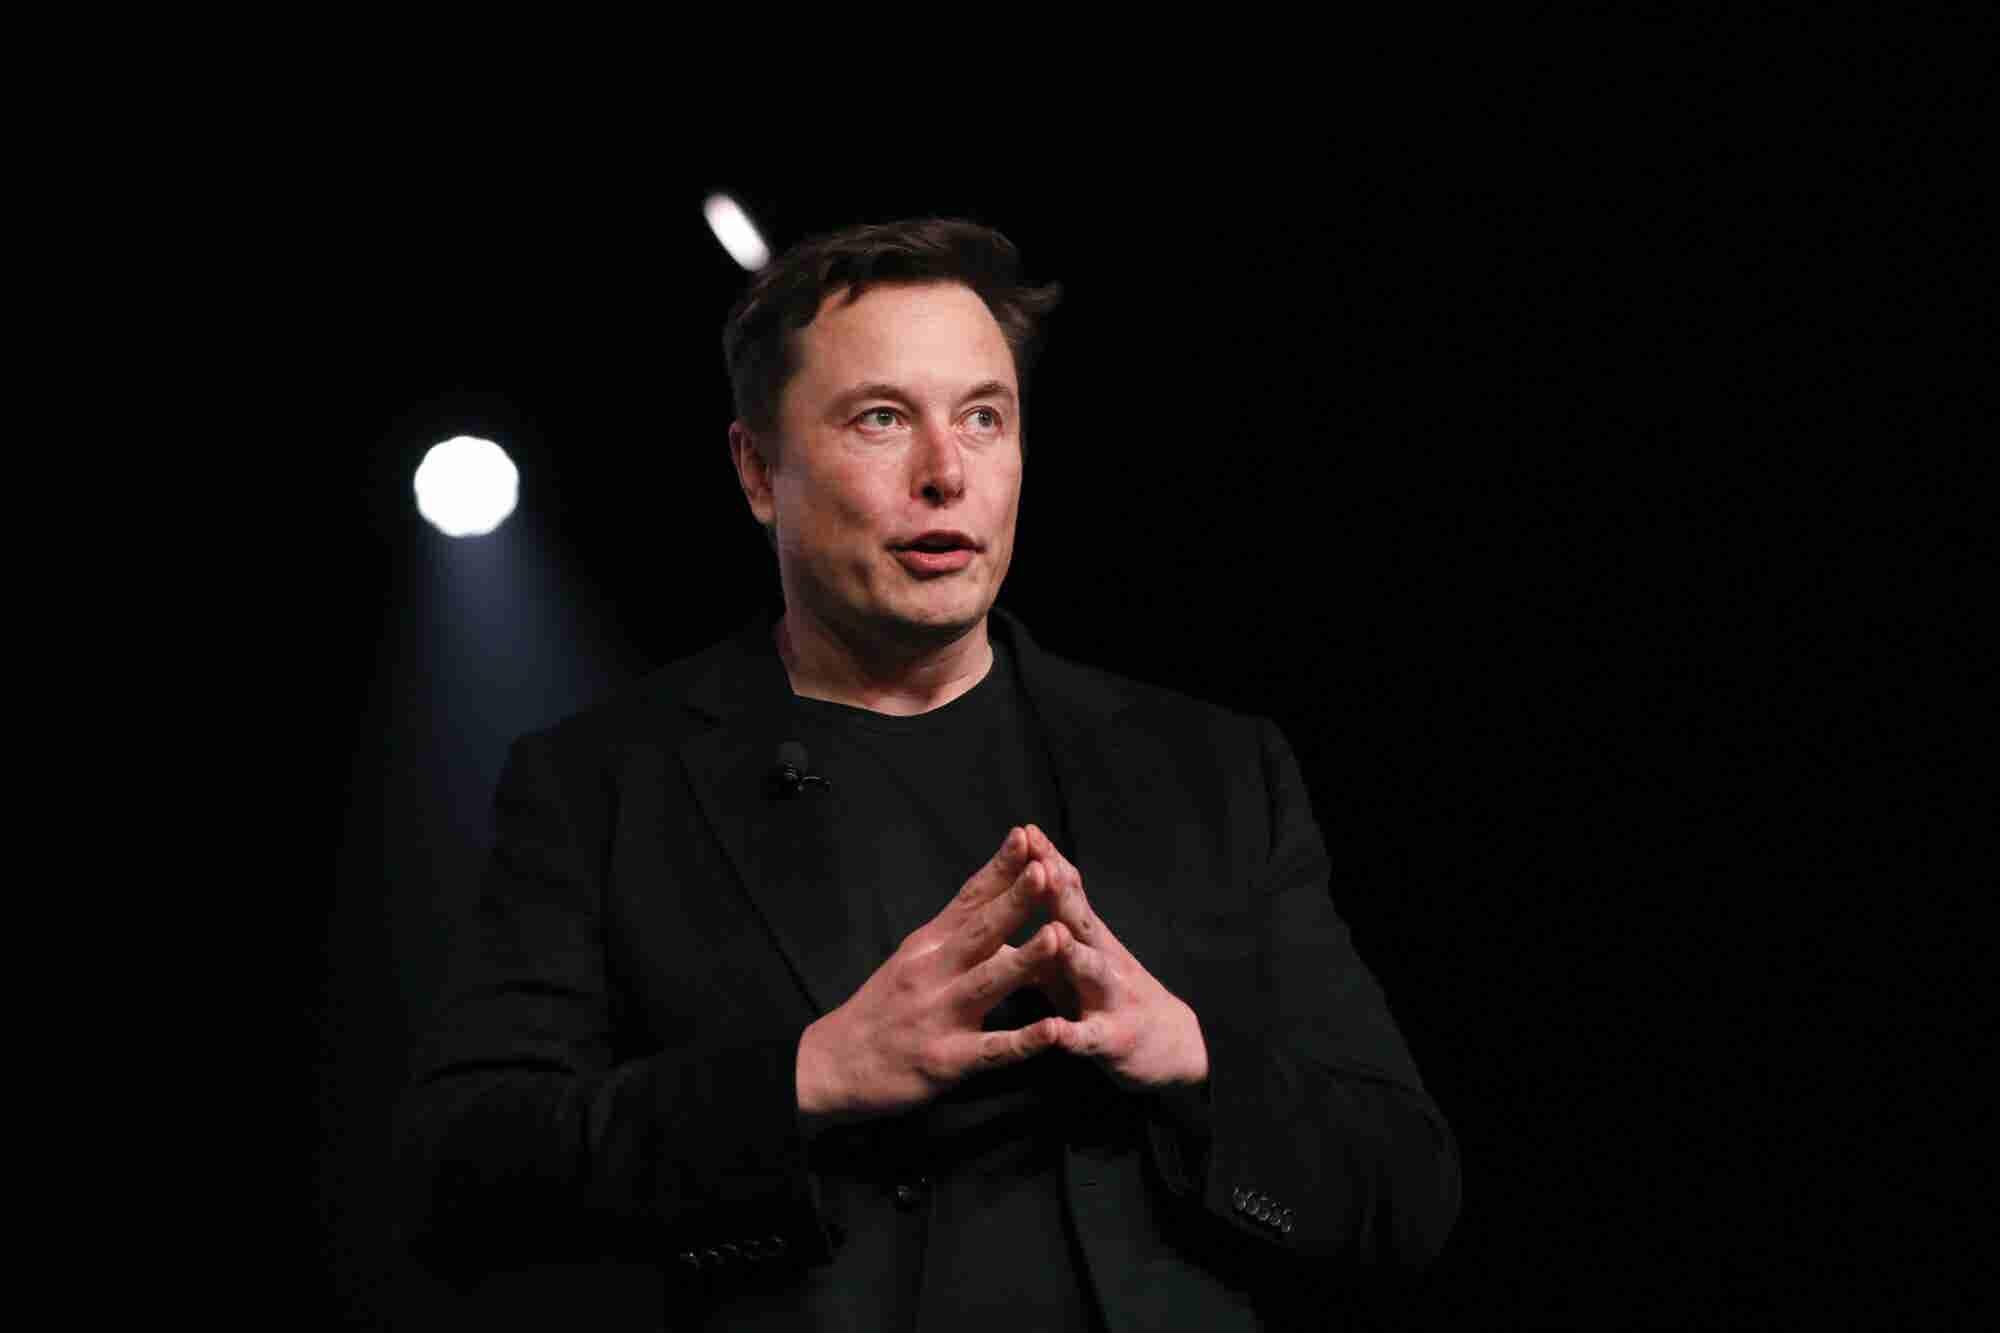 Tesla Stock Up as Elon Musk Announces Plans to Raise $2 Billion